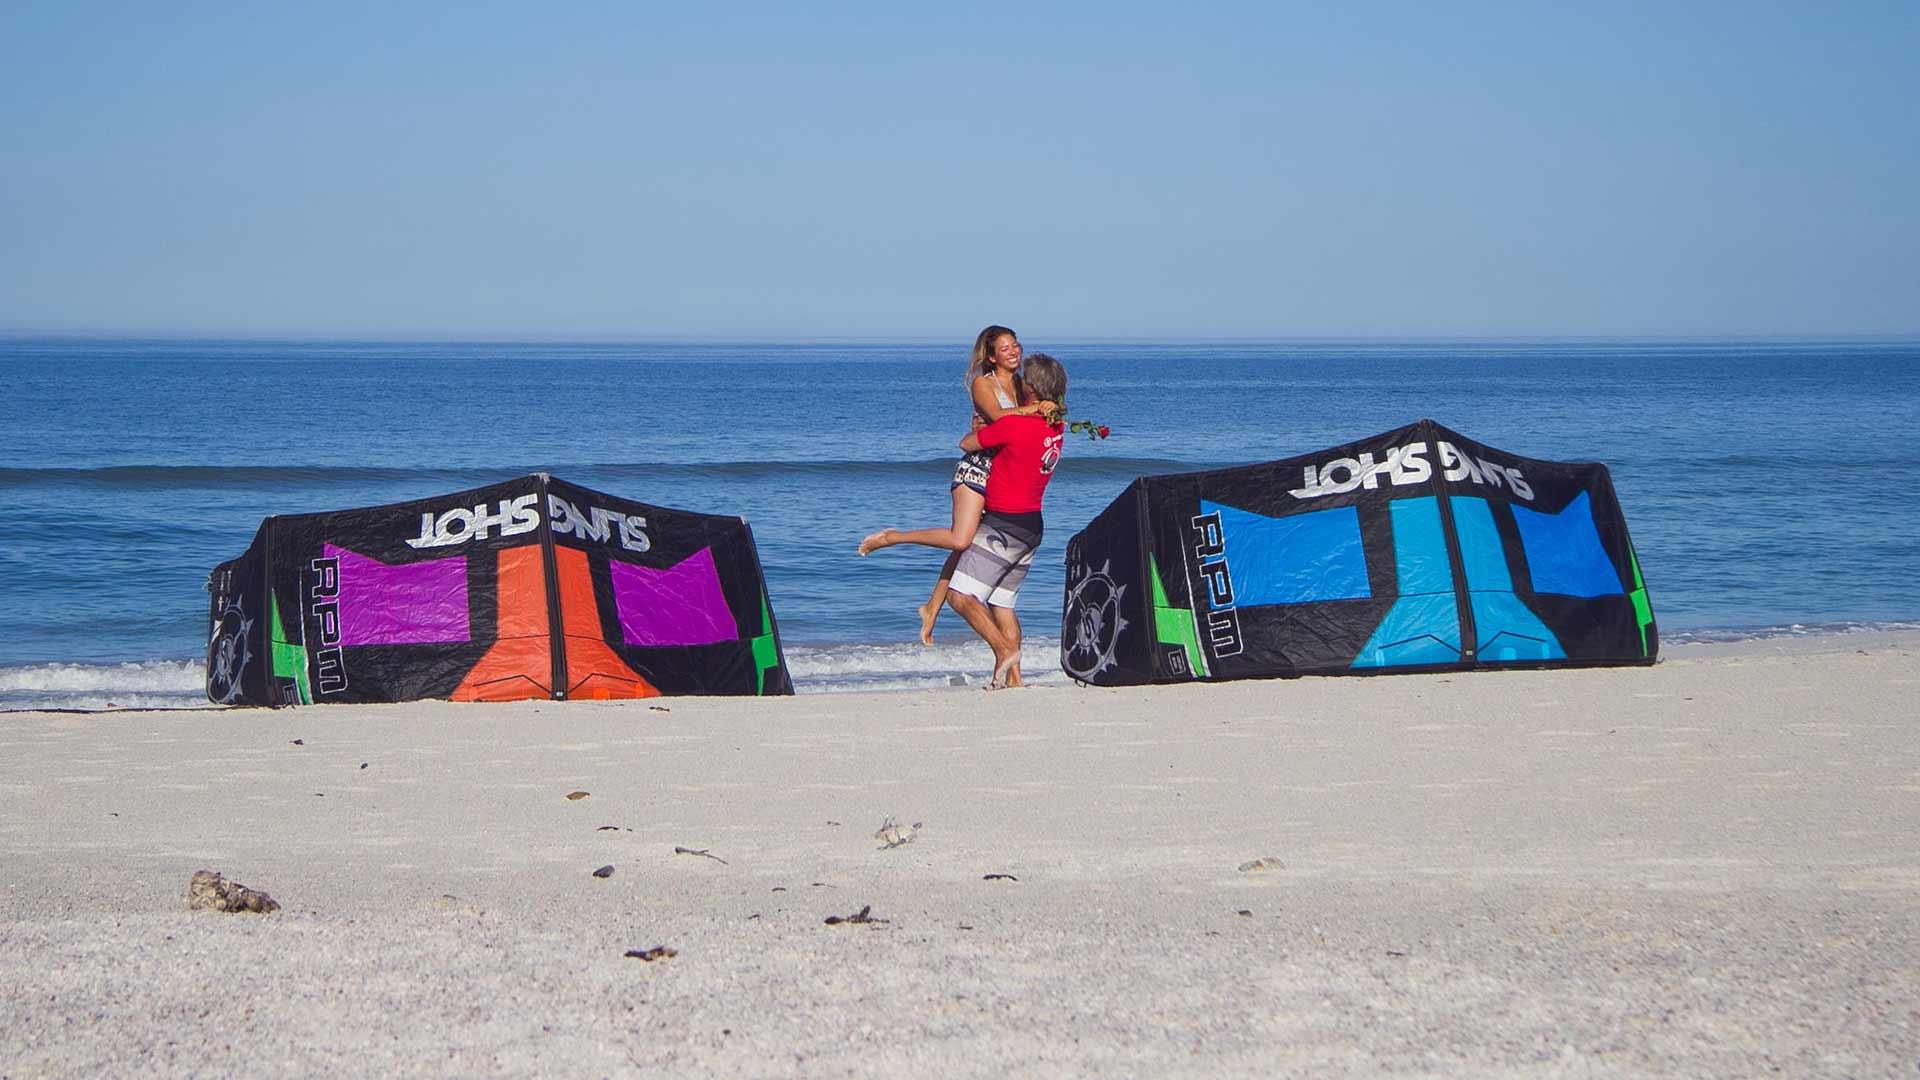 kitesurfing lesson success